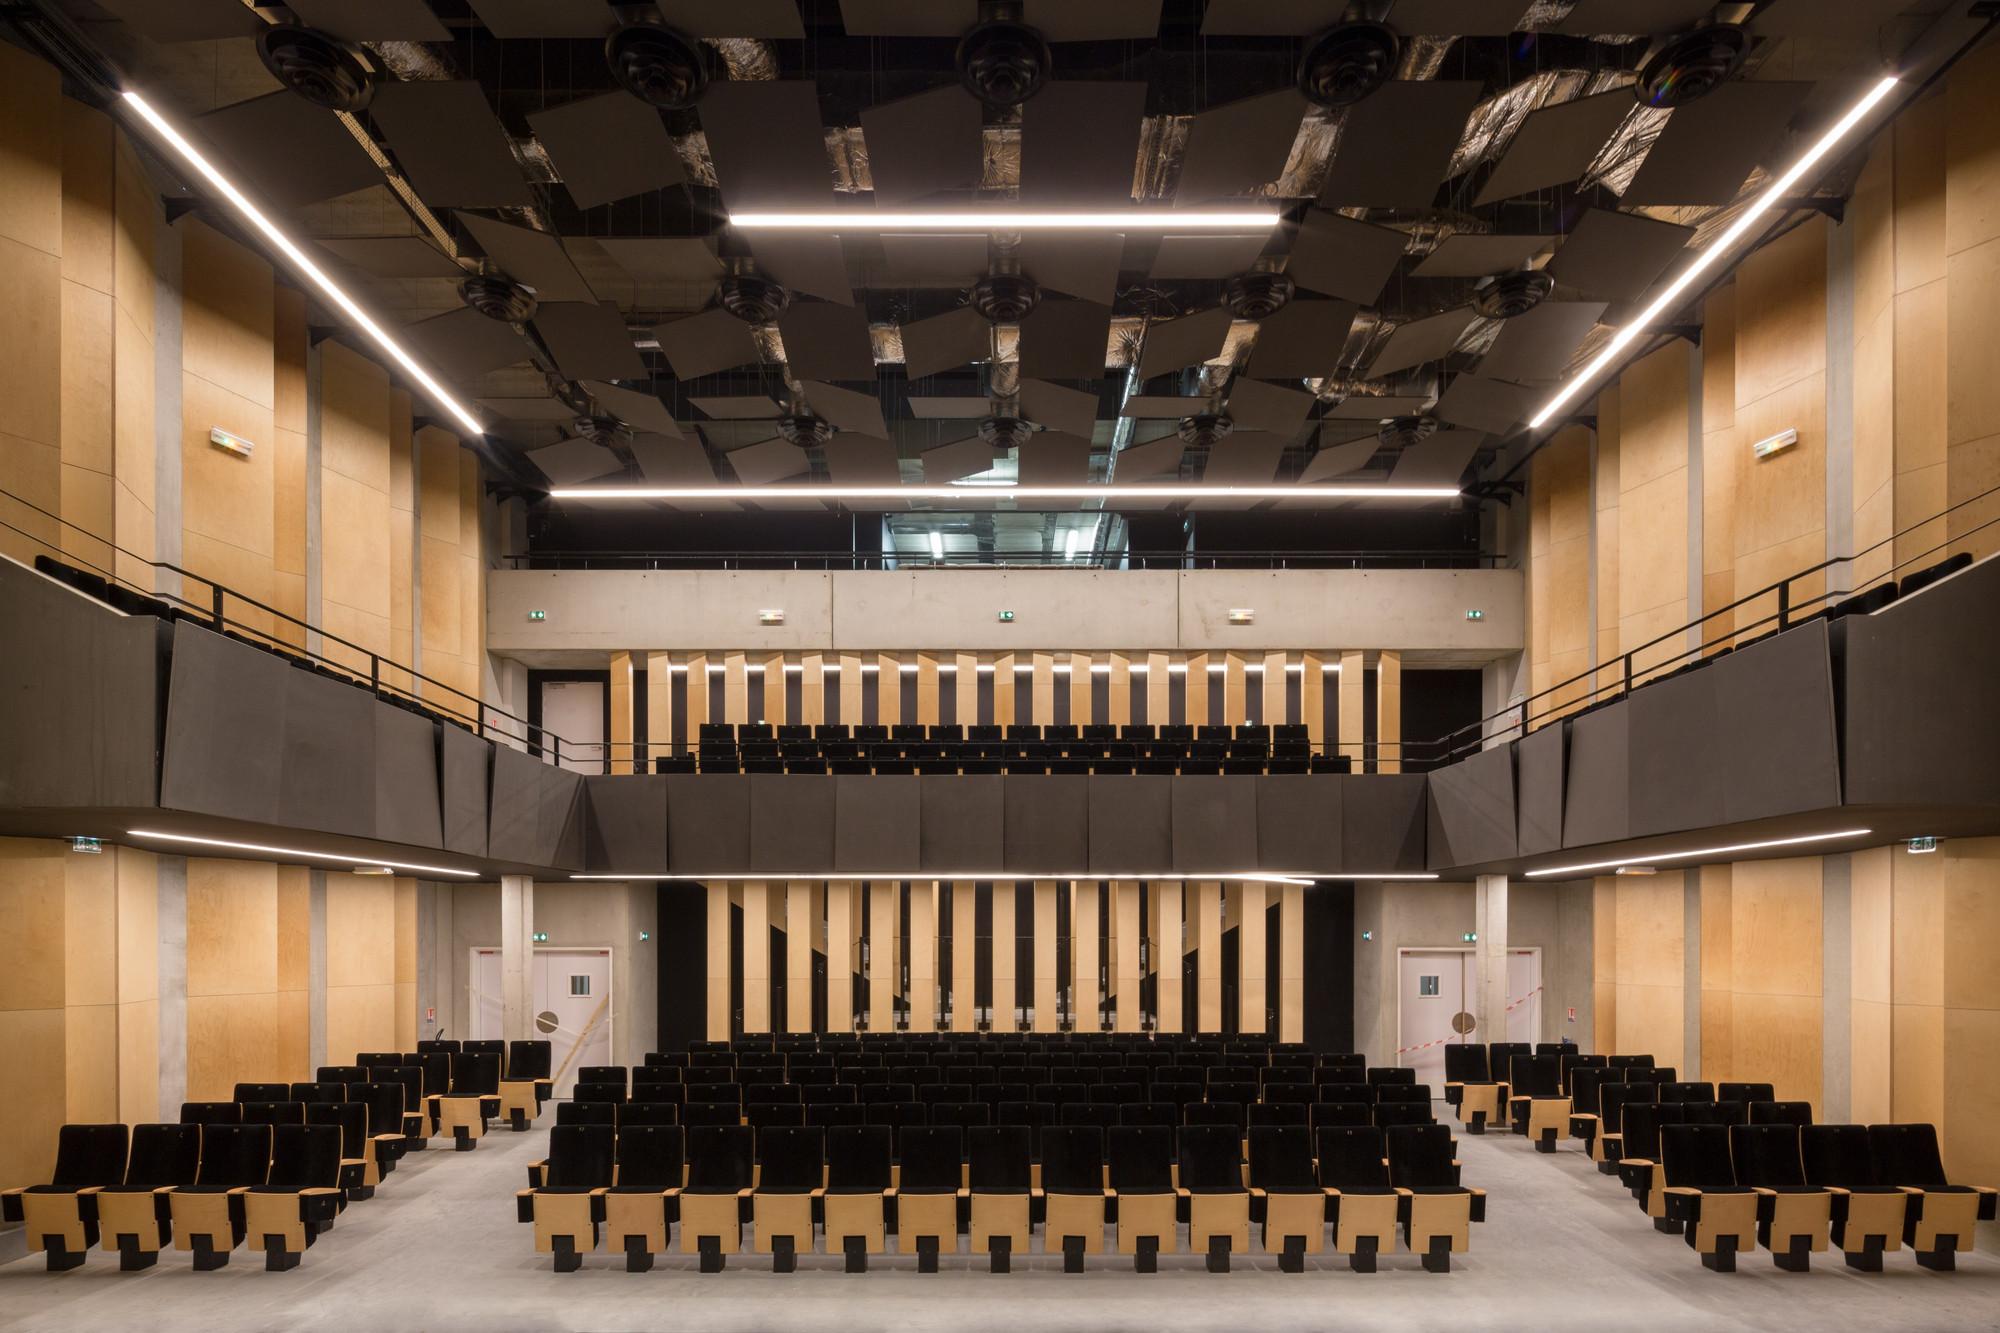 Gallery of Auditorium Of Bondy  Radio France Choral